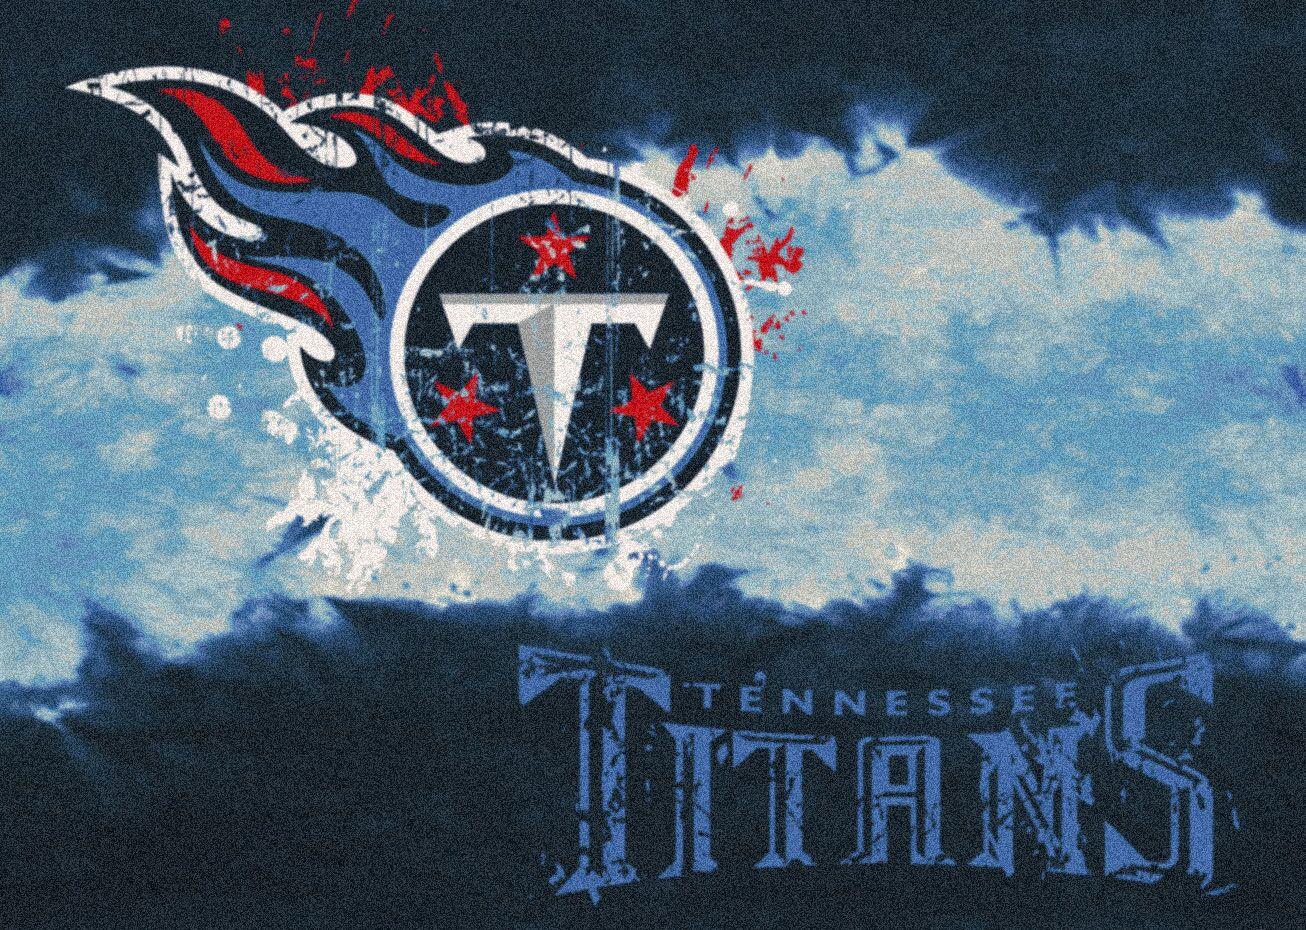 NFL Team Fade Novelty Rug NFL Team: Tennessee Titans